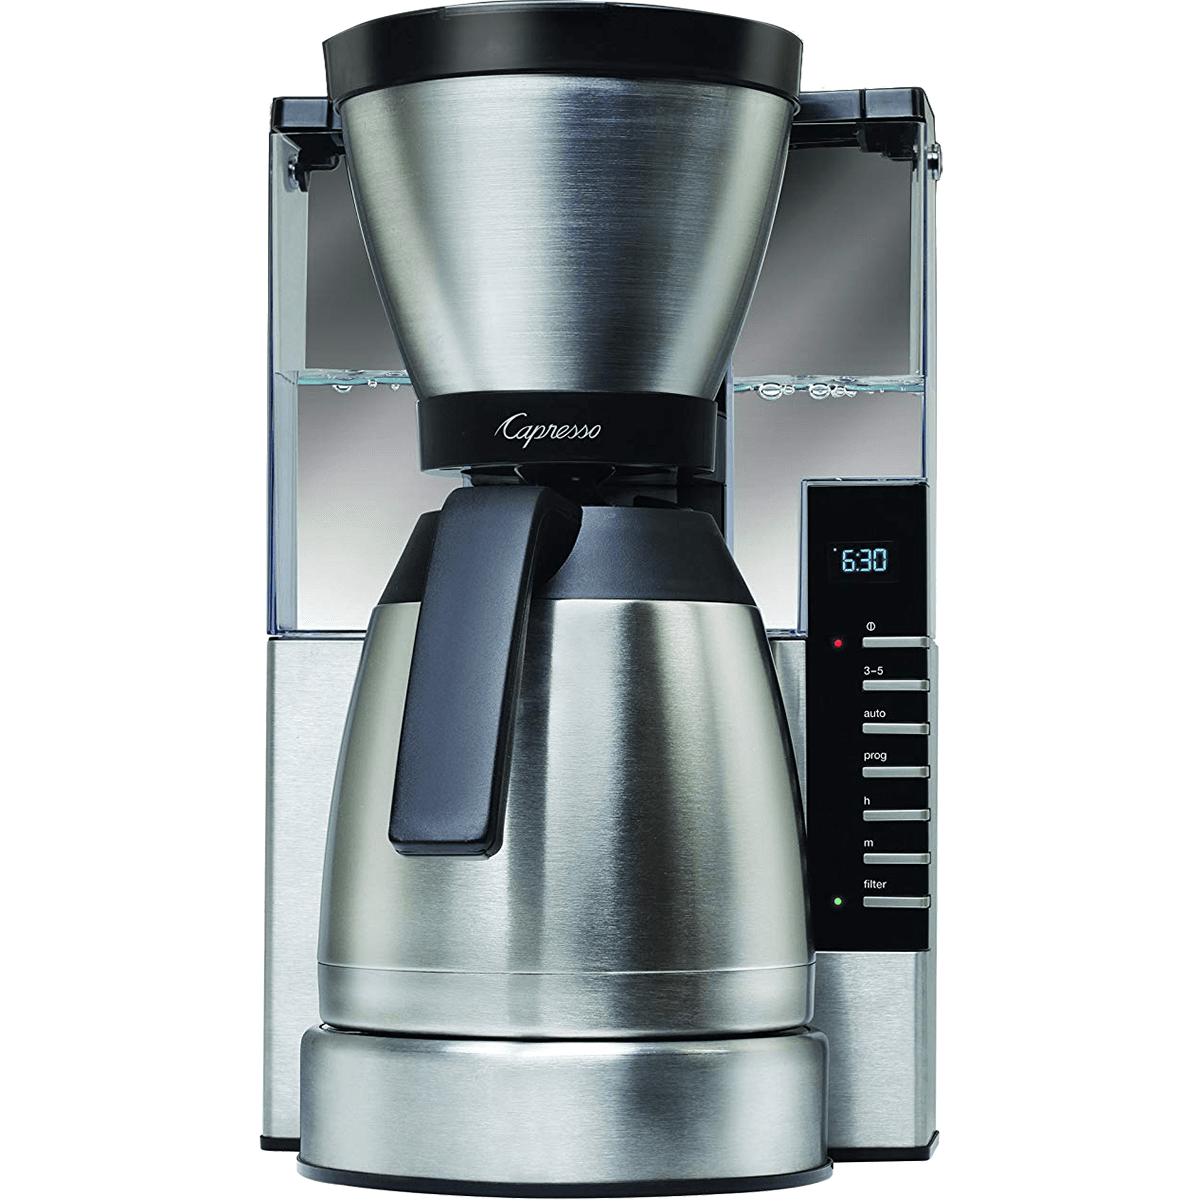 Capresso 10 Cup Rapid Brew Coffee Maker